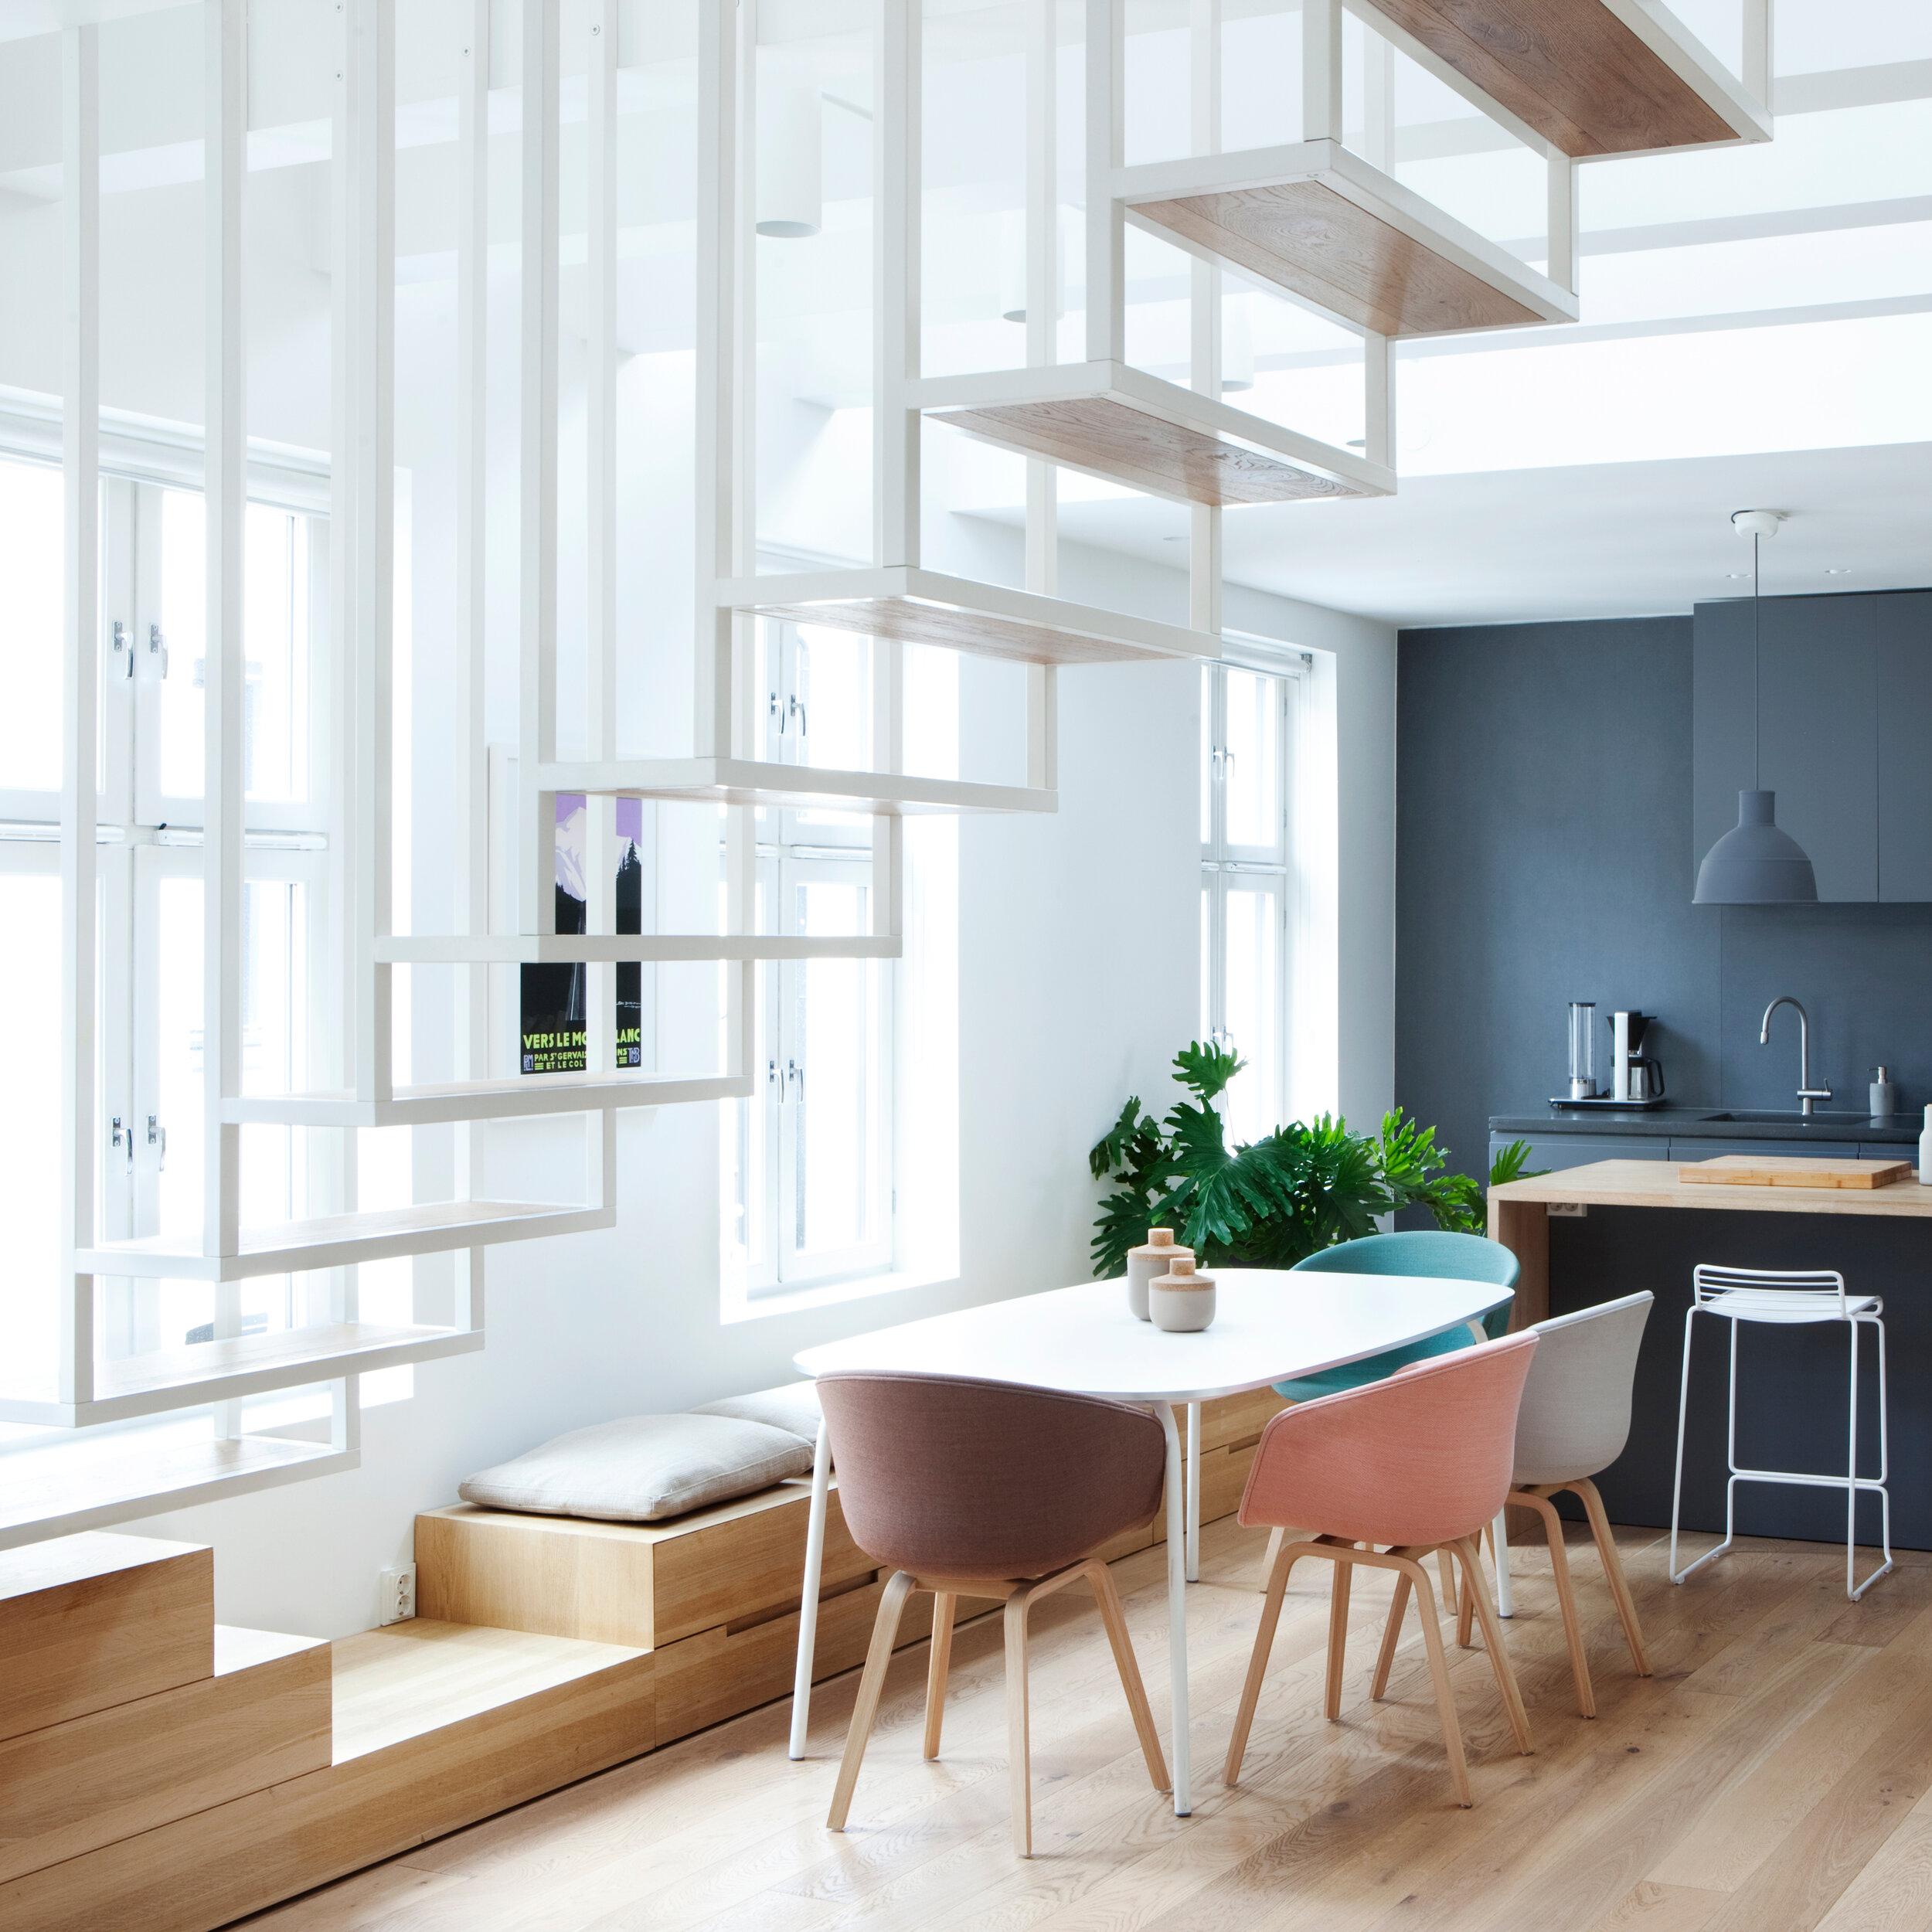 idunsgate-apartment-haptic-scandinavian-interiors-sq.jpg